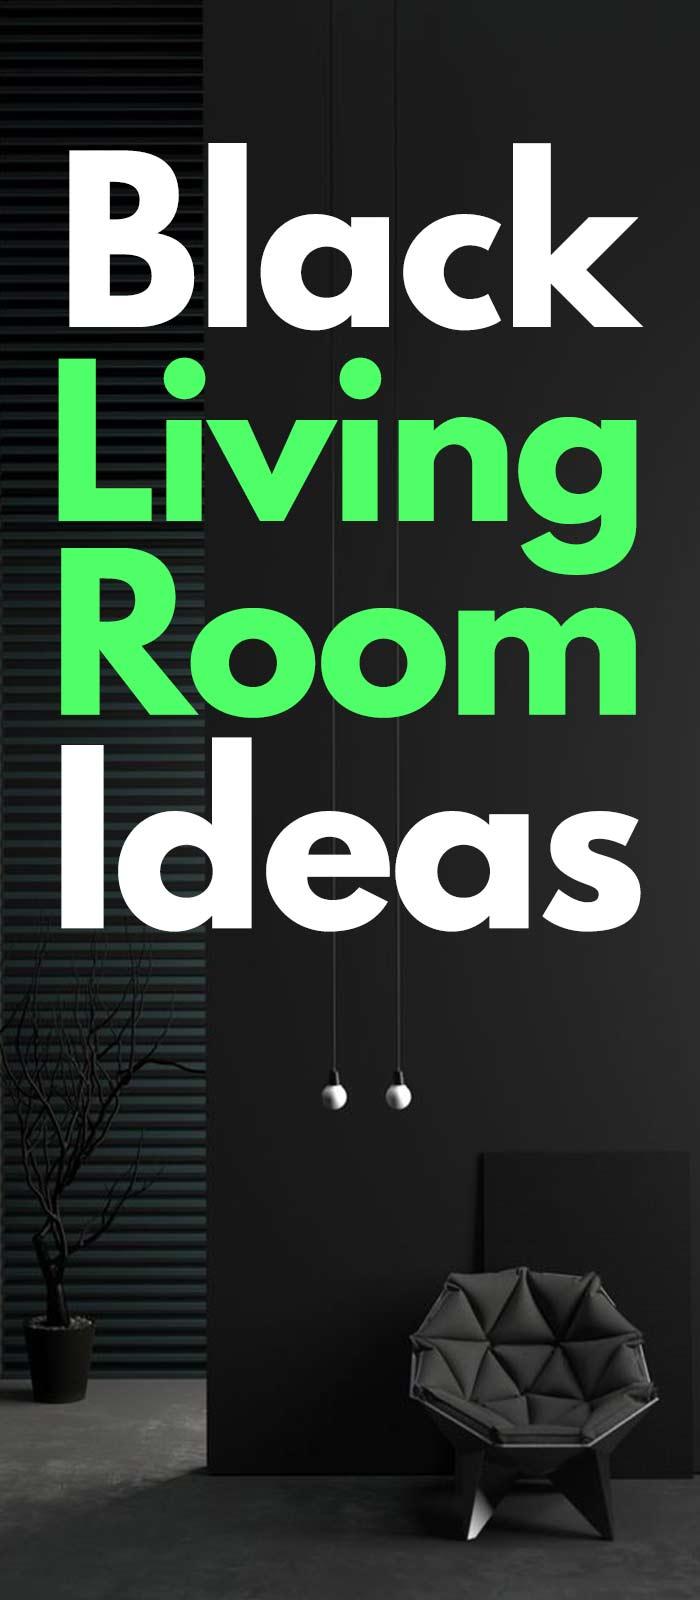 20+ Marvelous Black Living Room Ideas!